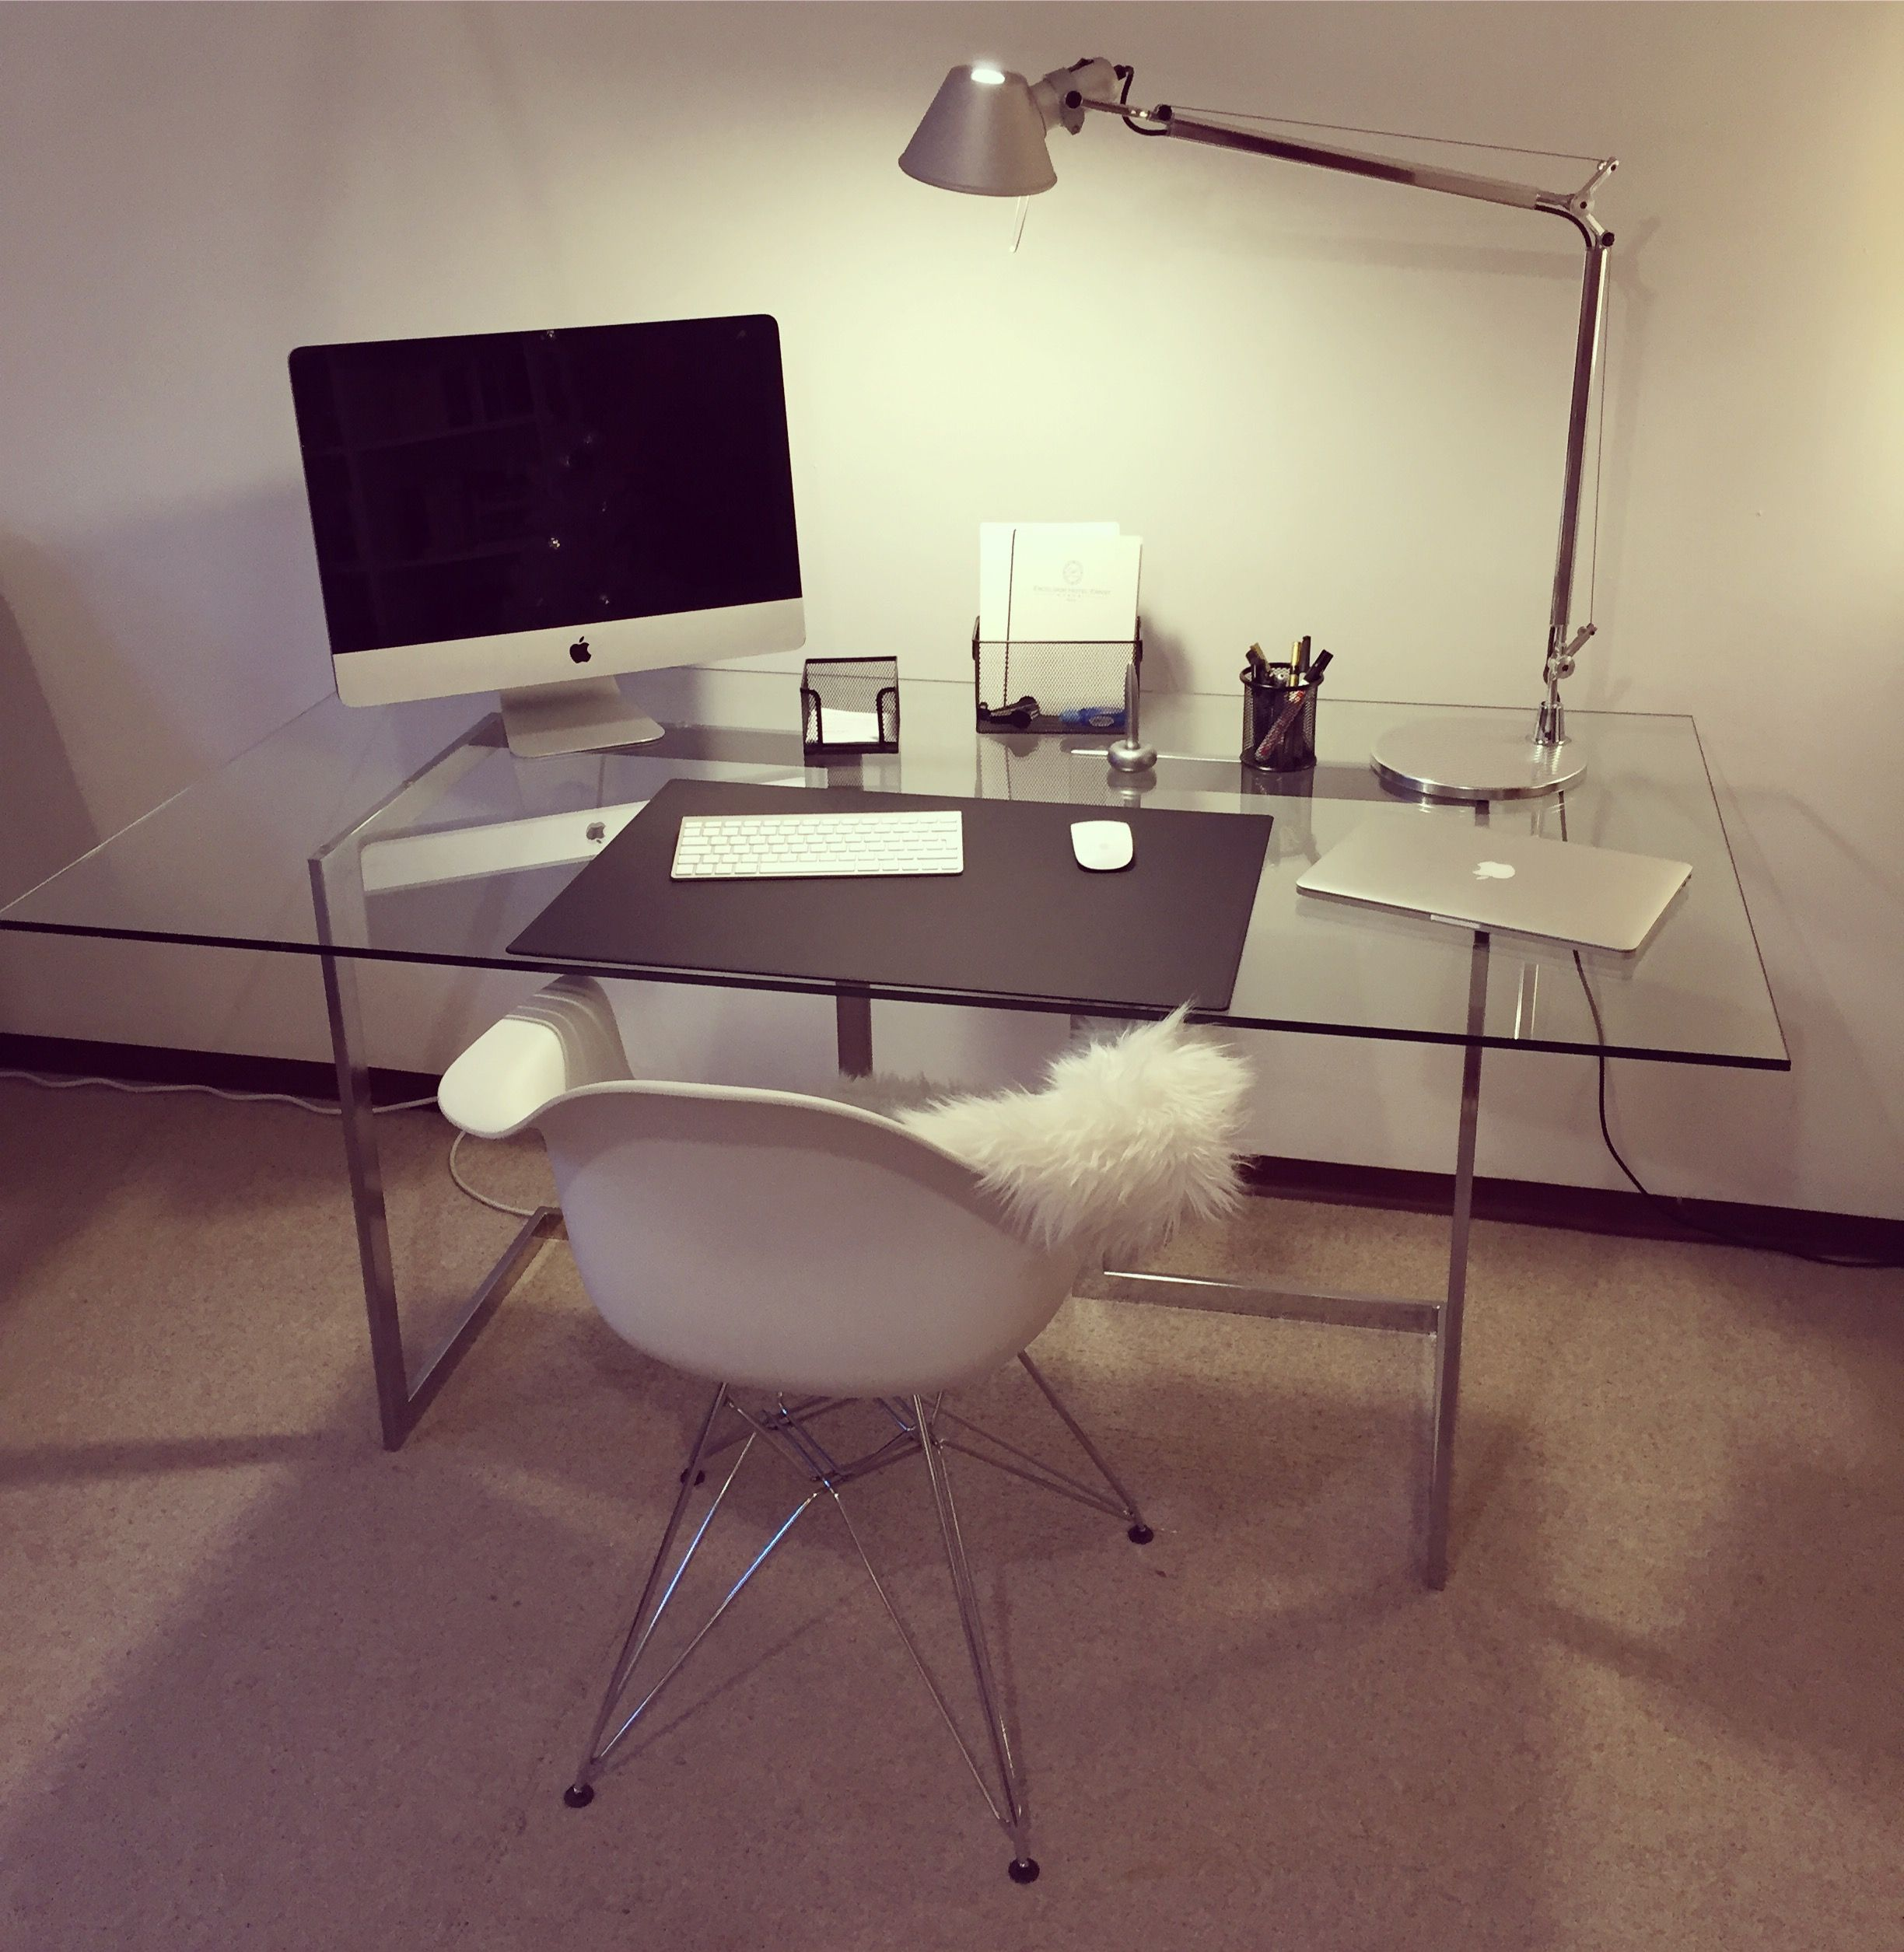 Kare design schreibtisch mit eames stuhl artemide tolomeo for Eames design stuhl